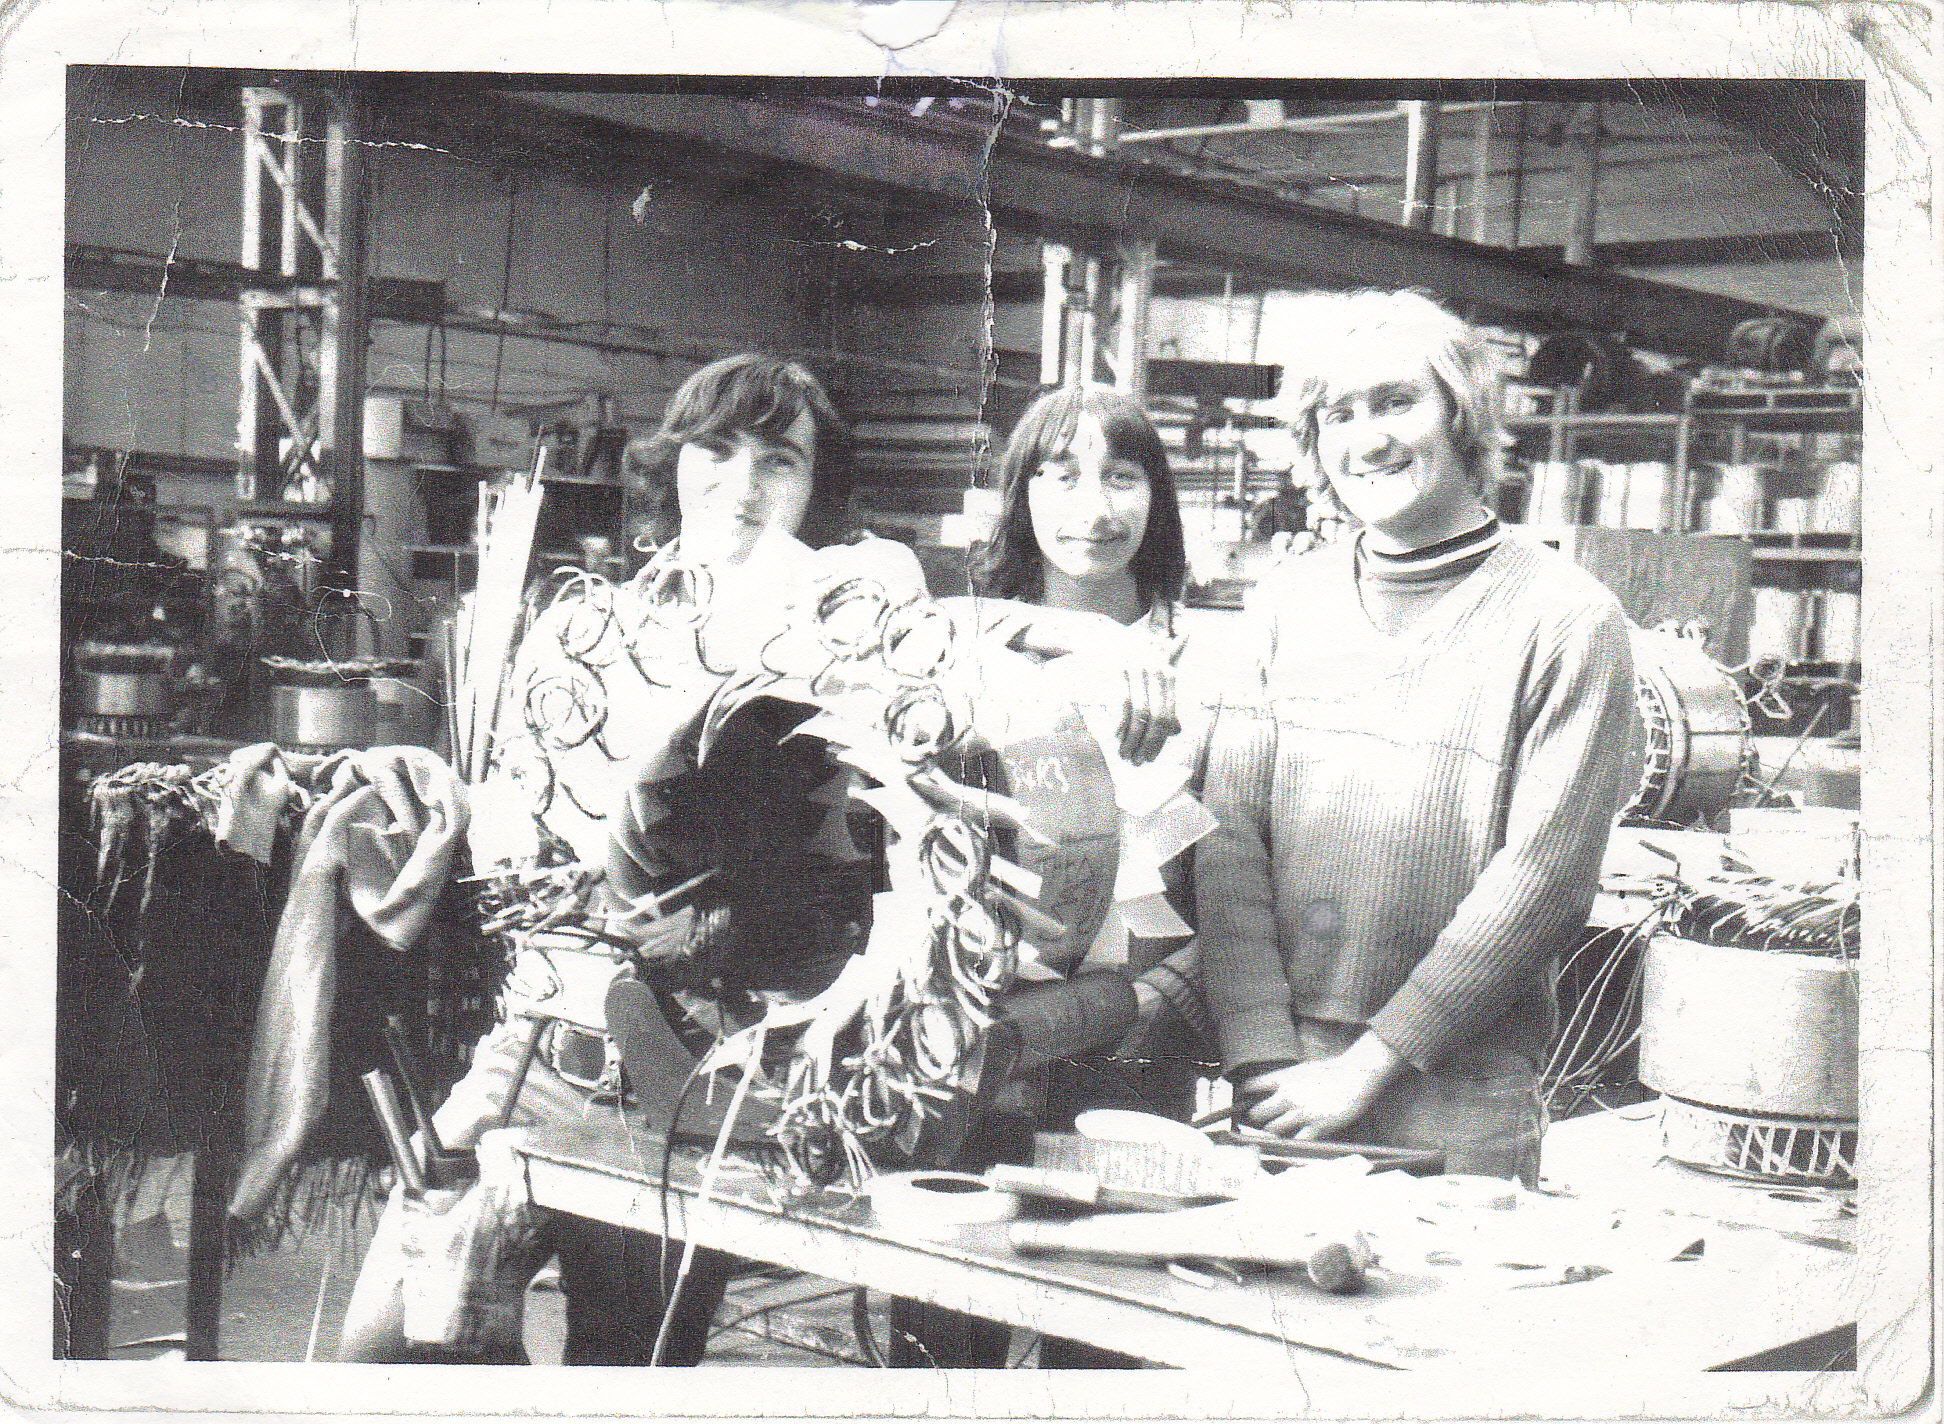 45 Years Of Rewinding Motors At Mawdsleys